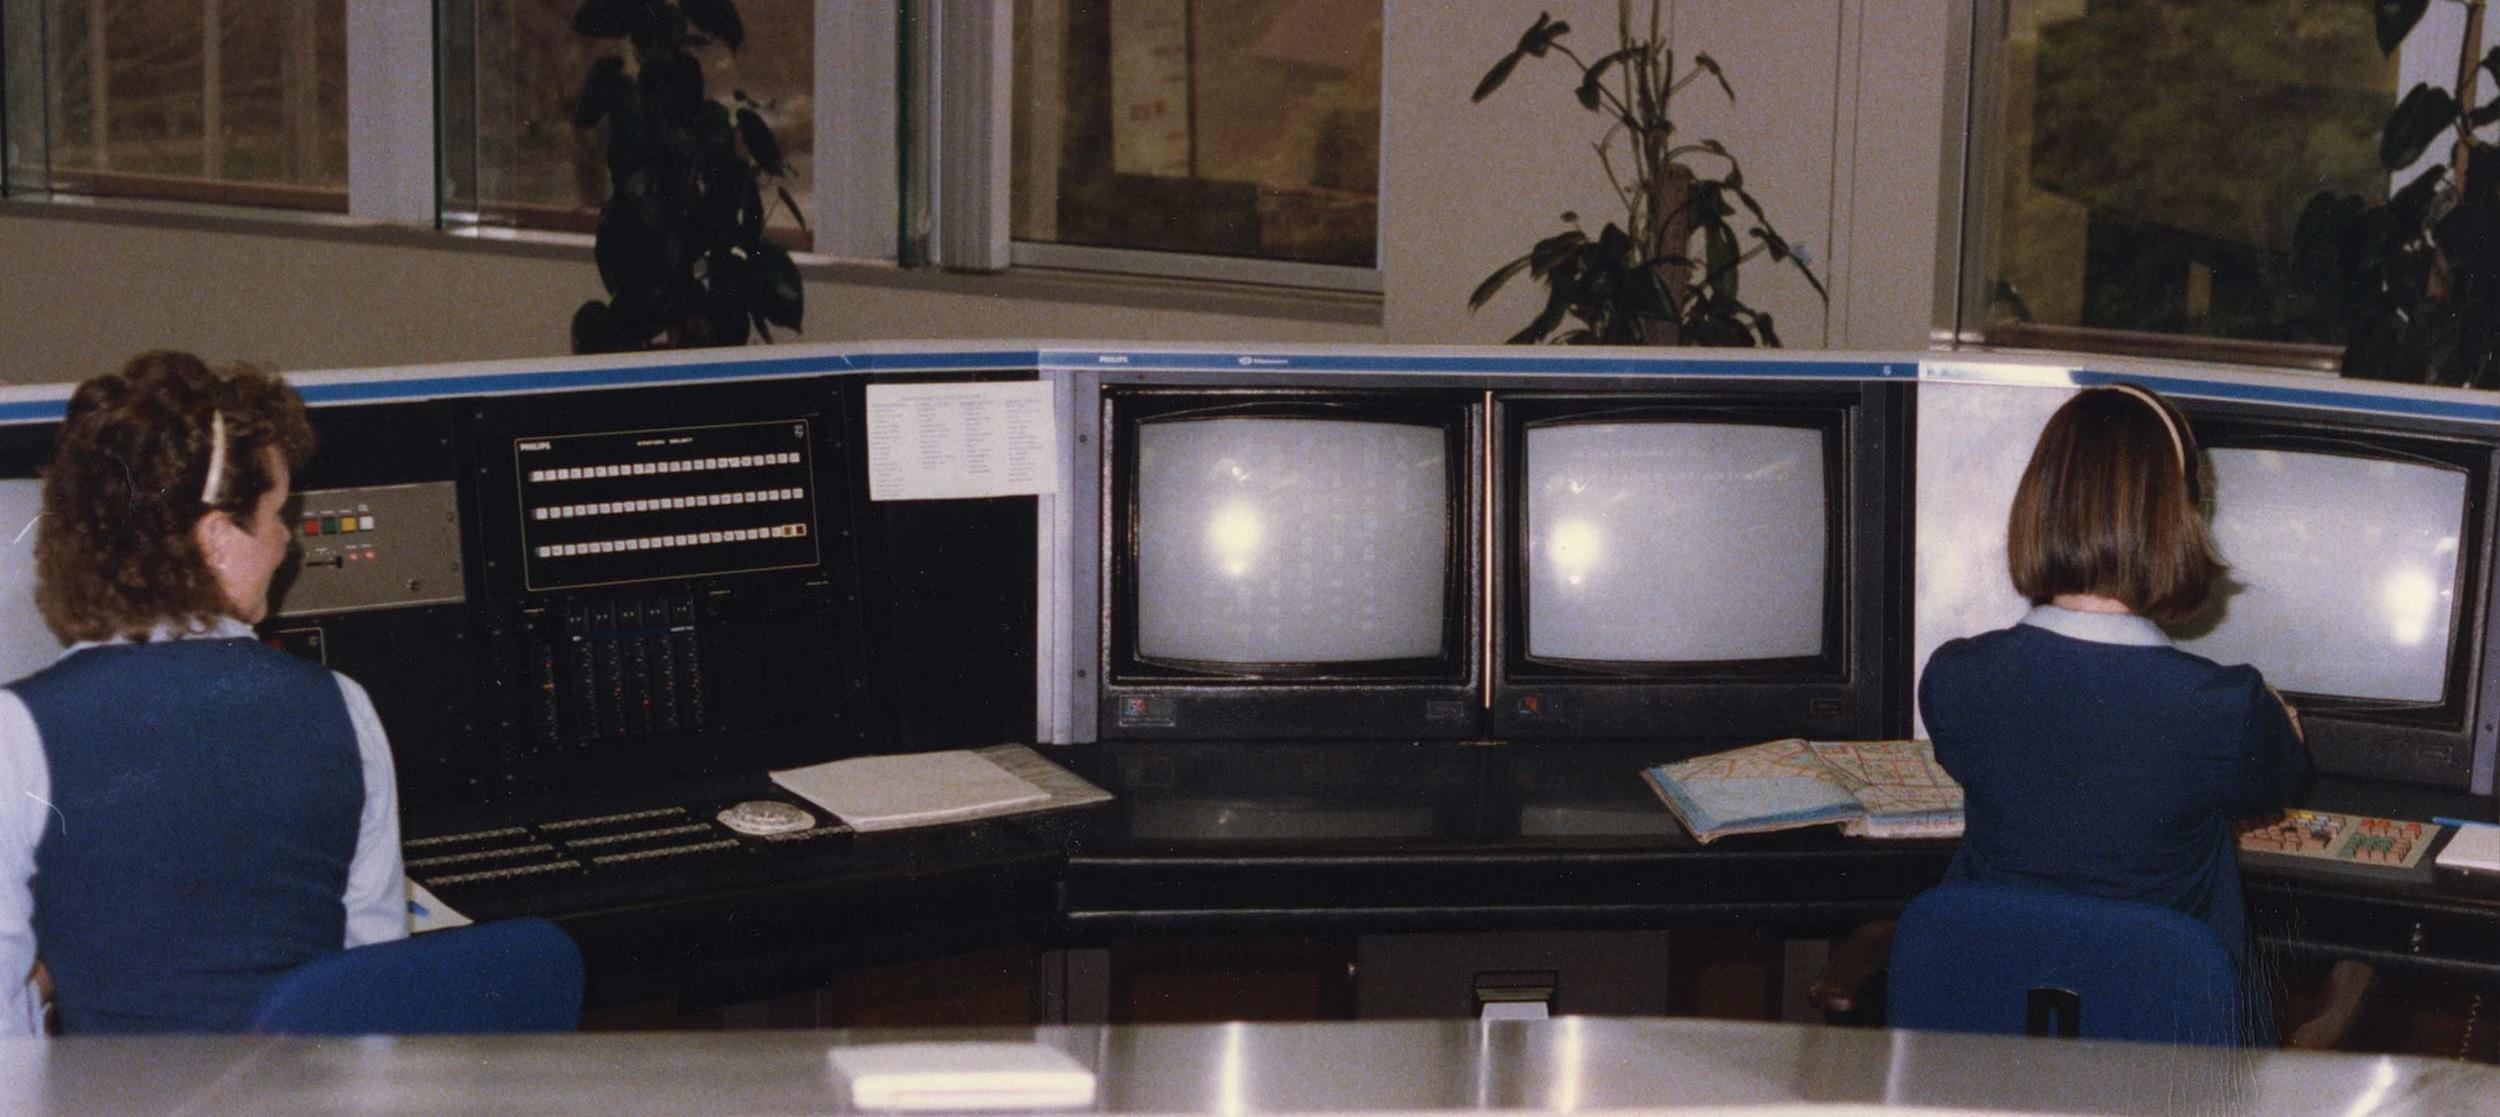 operational-communications1.jpg